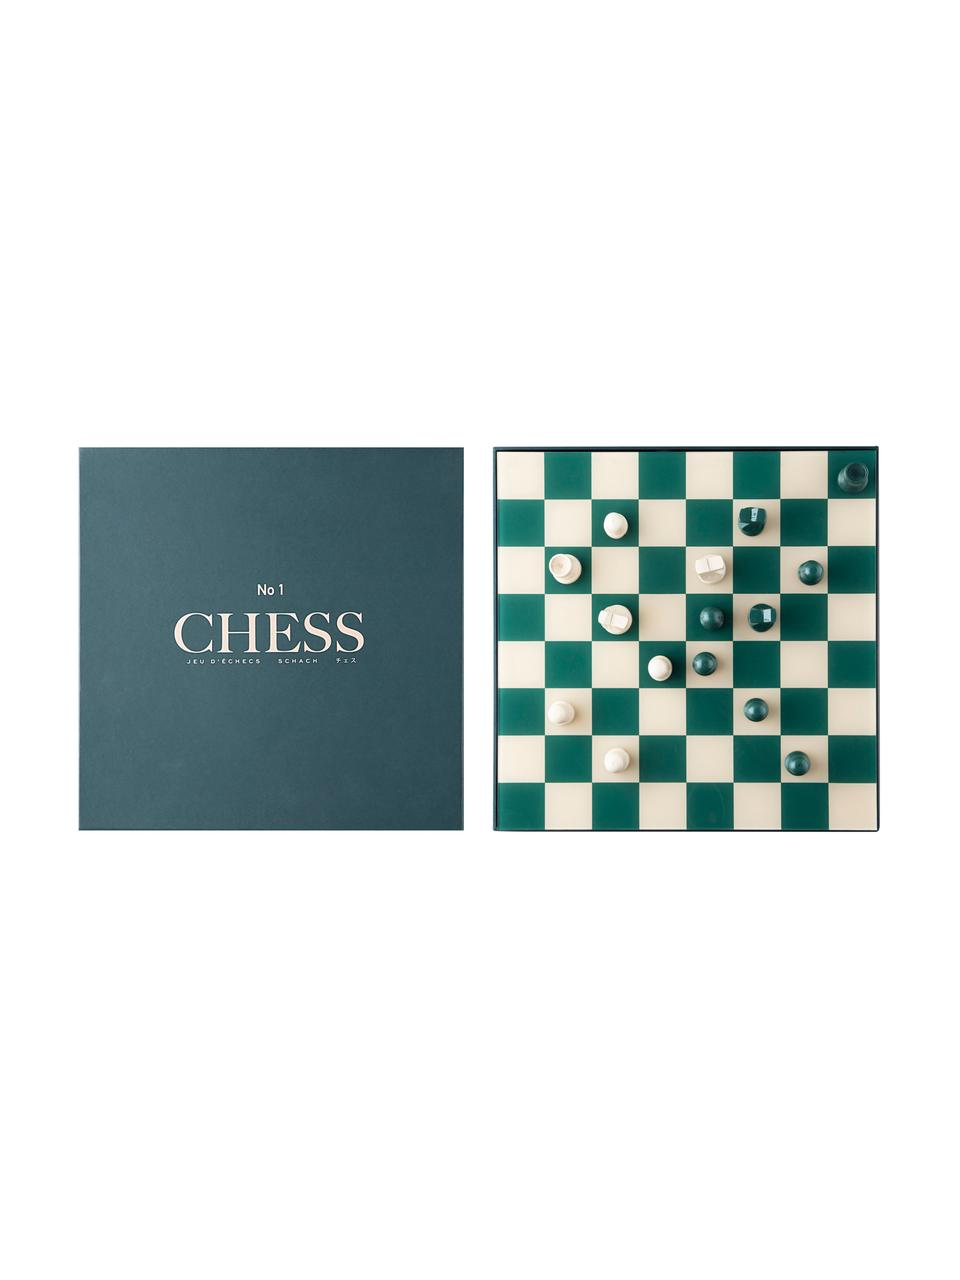 Schaakspel Classic, Papier, acryl, Beige, groen, 25 x 5 cm